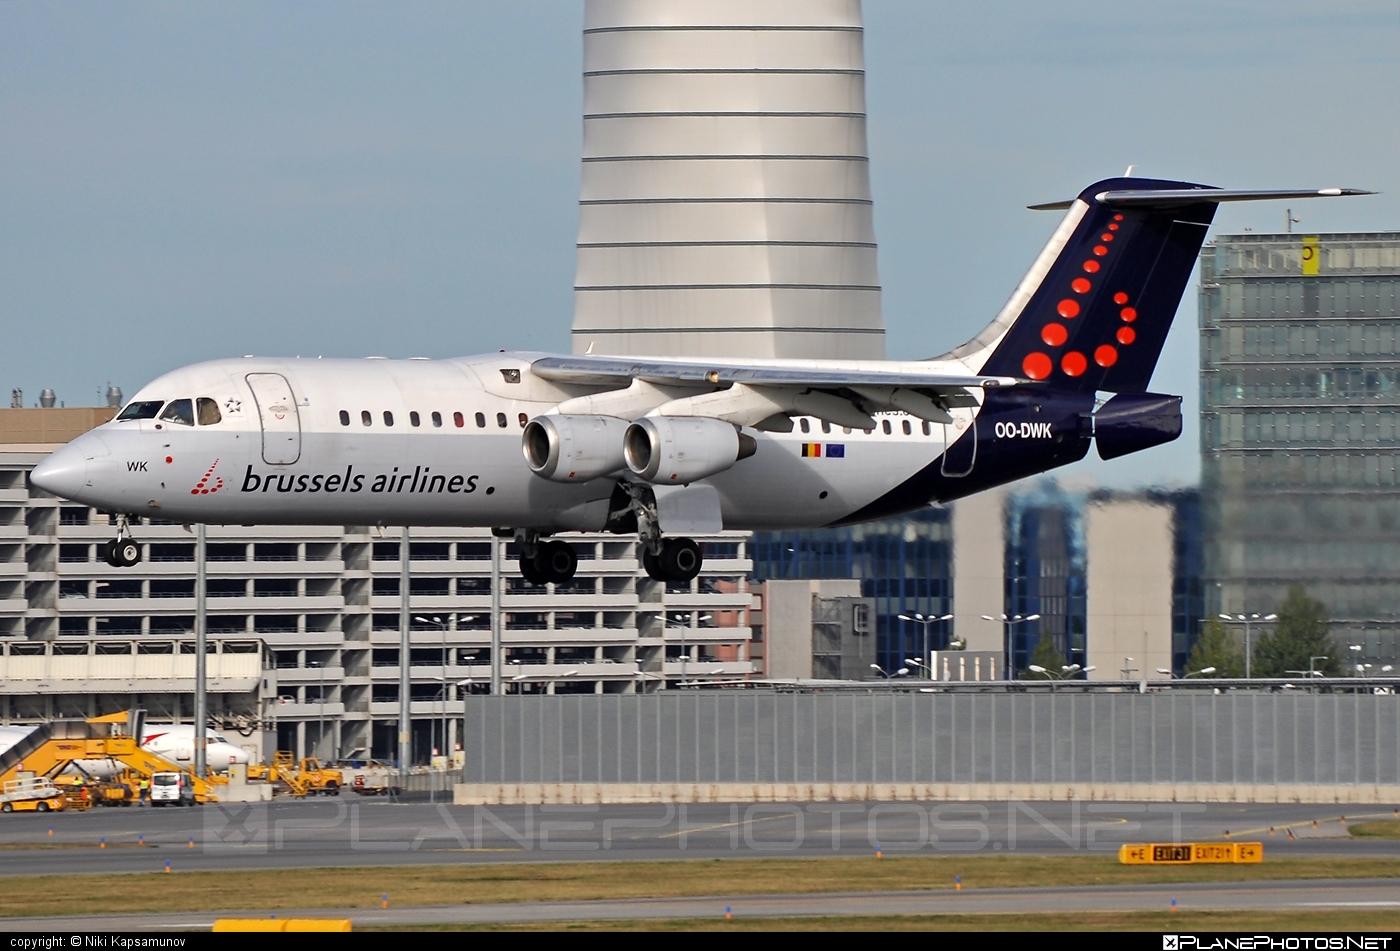 British Aerospace Avro RJ100 - OO-DWK operated by Brussels Airlines #avro146rj100 #avrorj100 #bae146 #britishaerospace #brusselsairlines